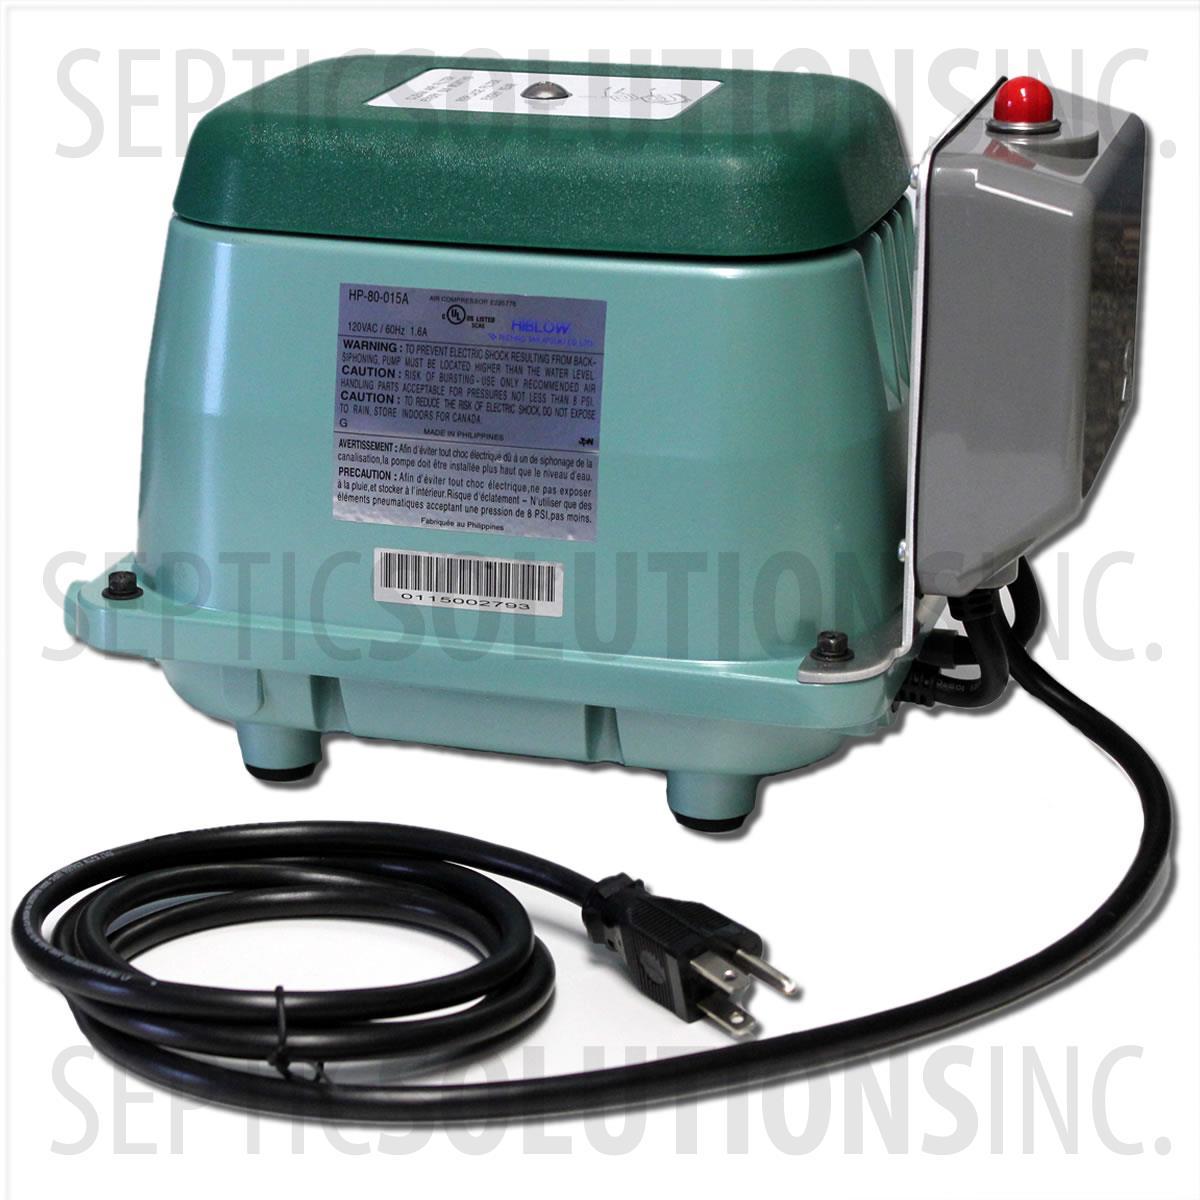 H500A_2?w=300 hoot troy air aerobic system air pumps and repair parts  at alyssarenee.co